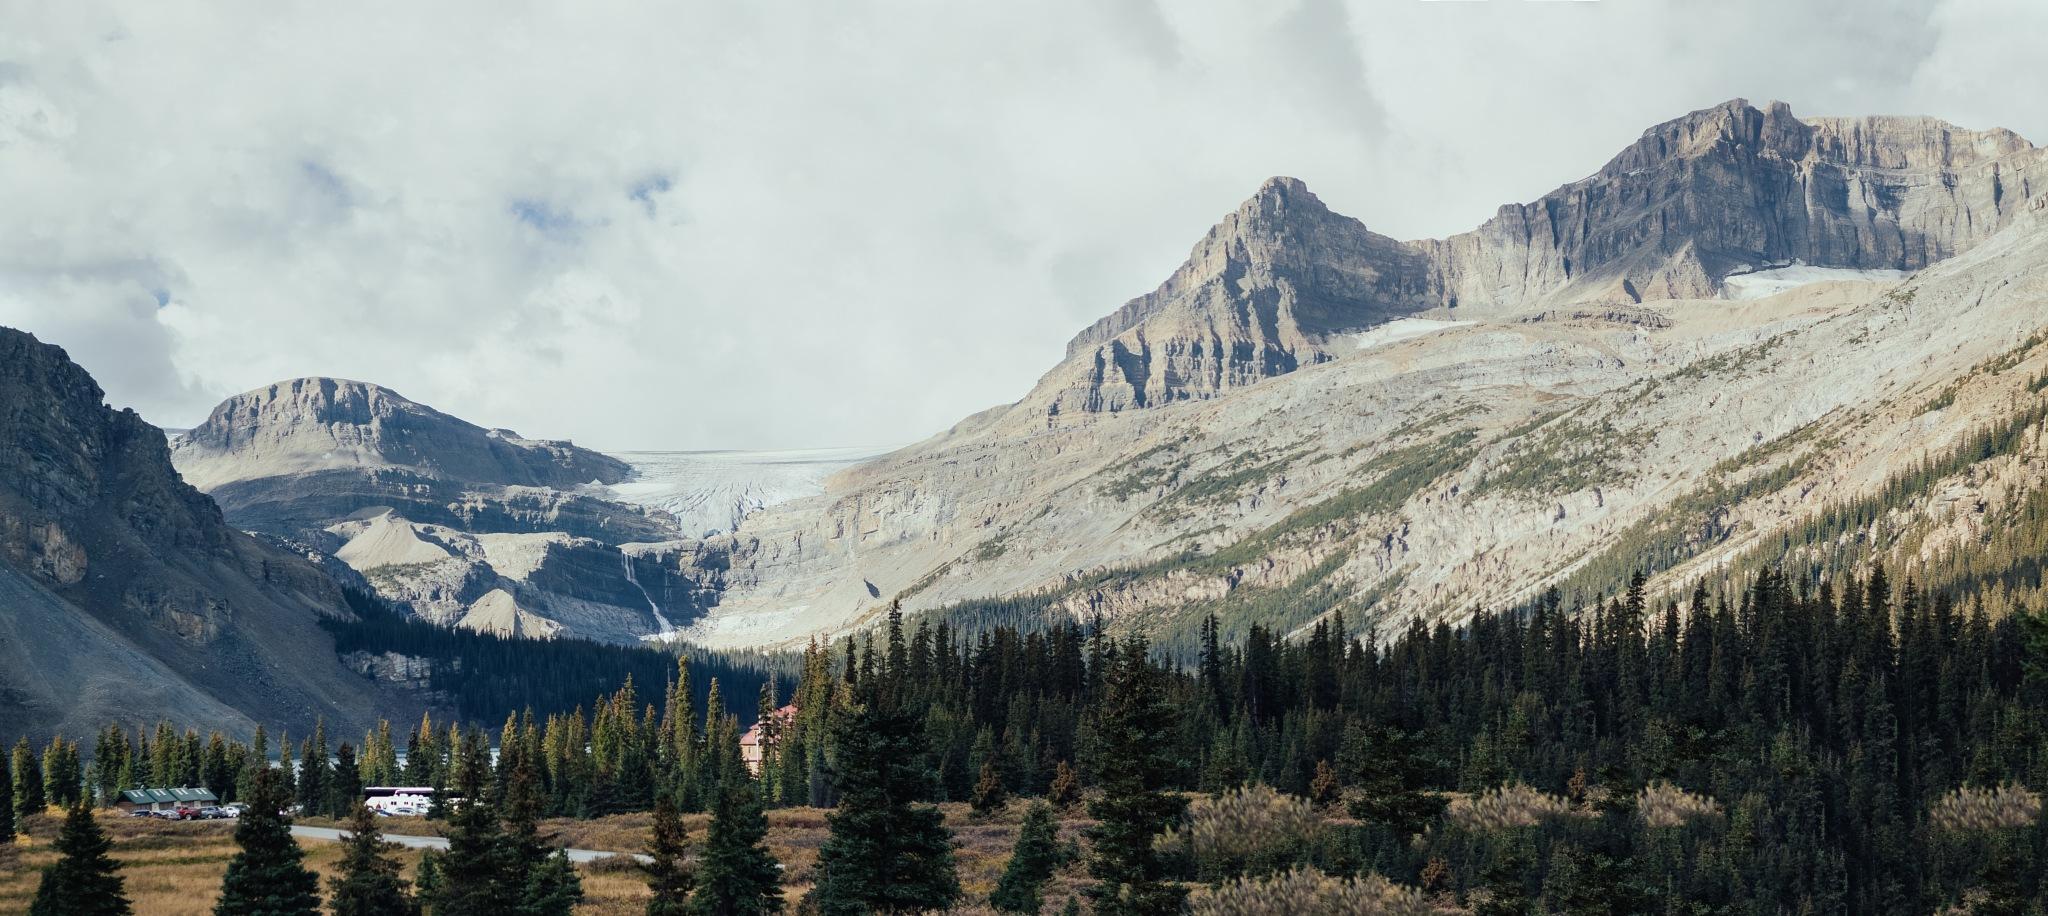 Bow glacier by Inbal Rubin